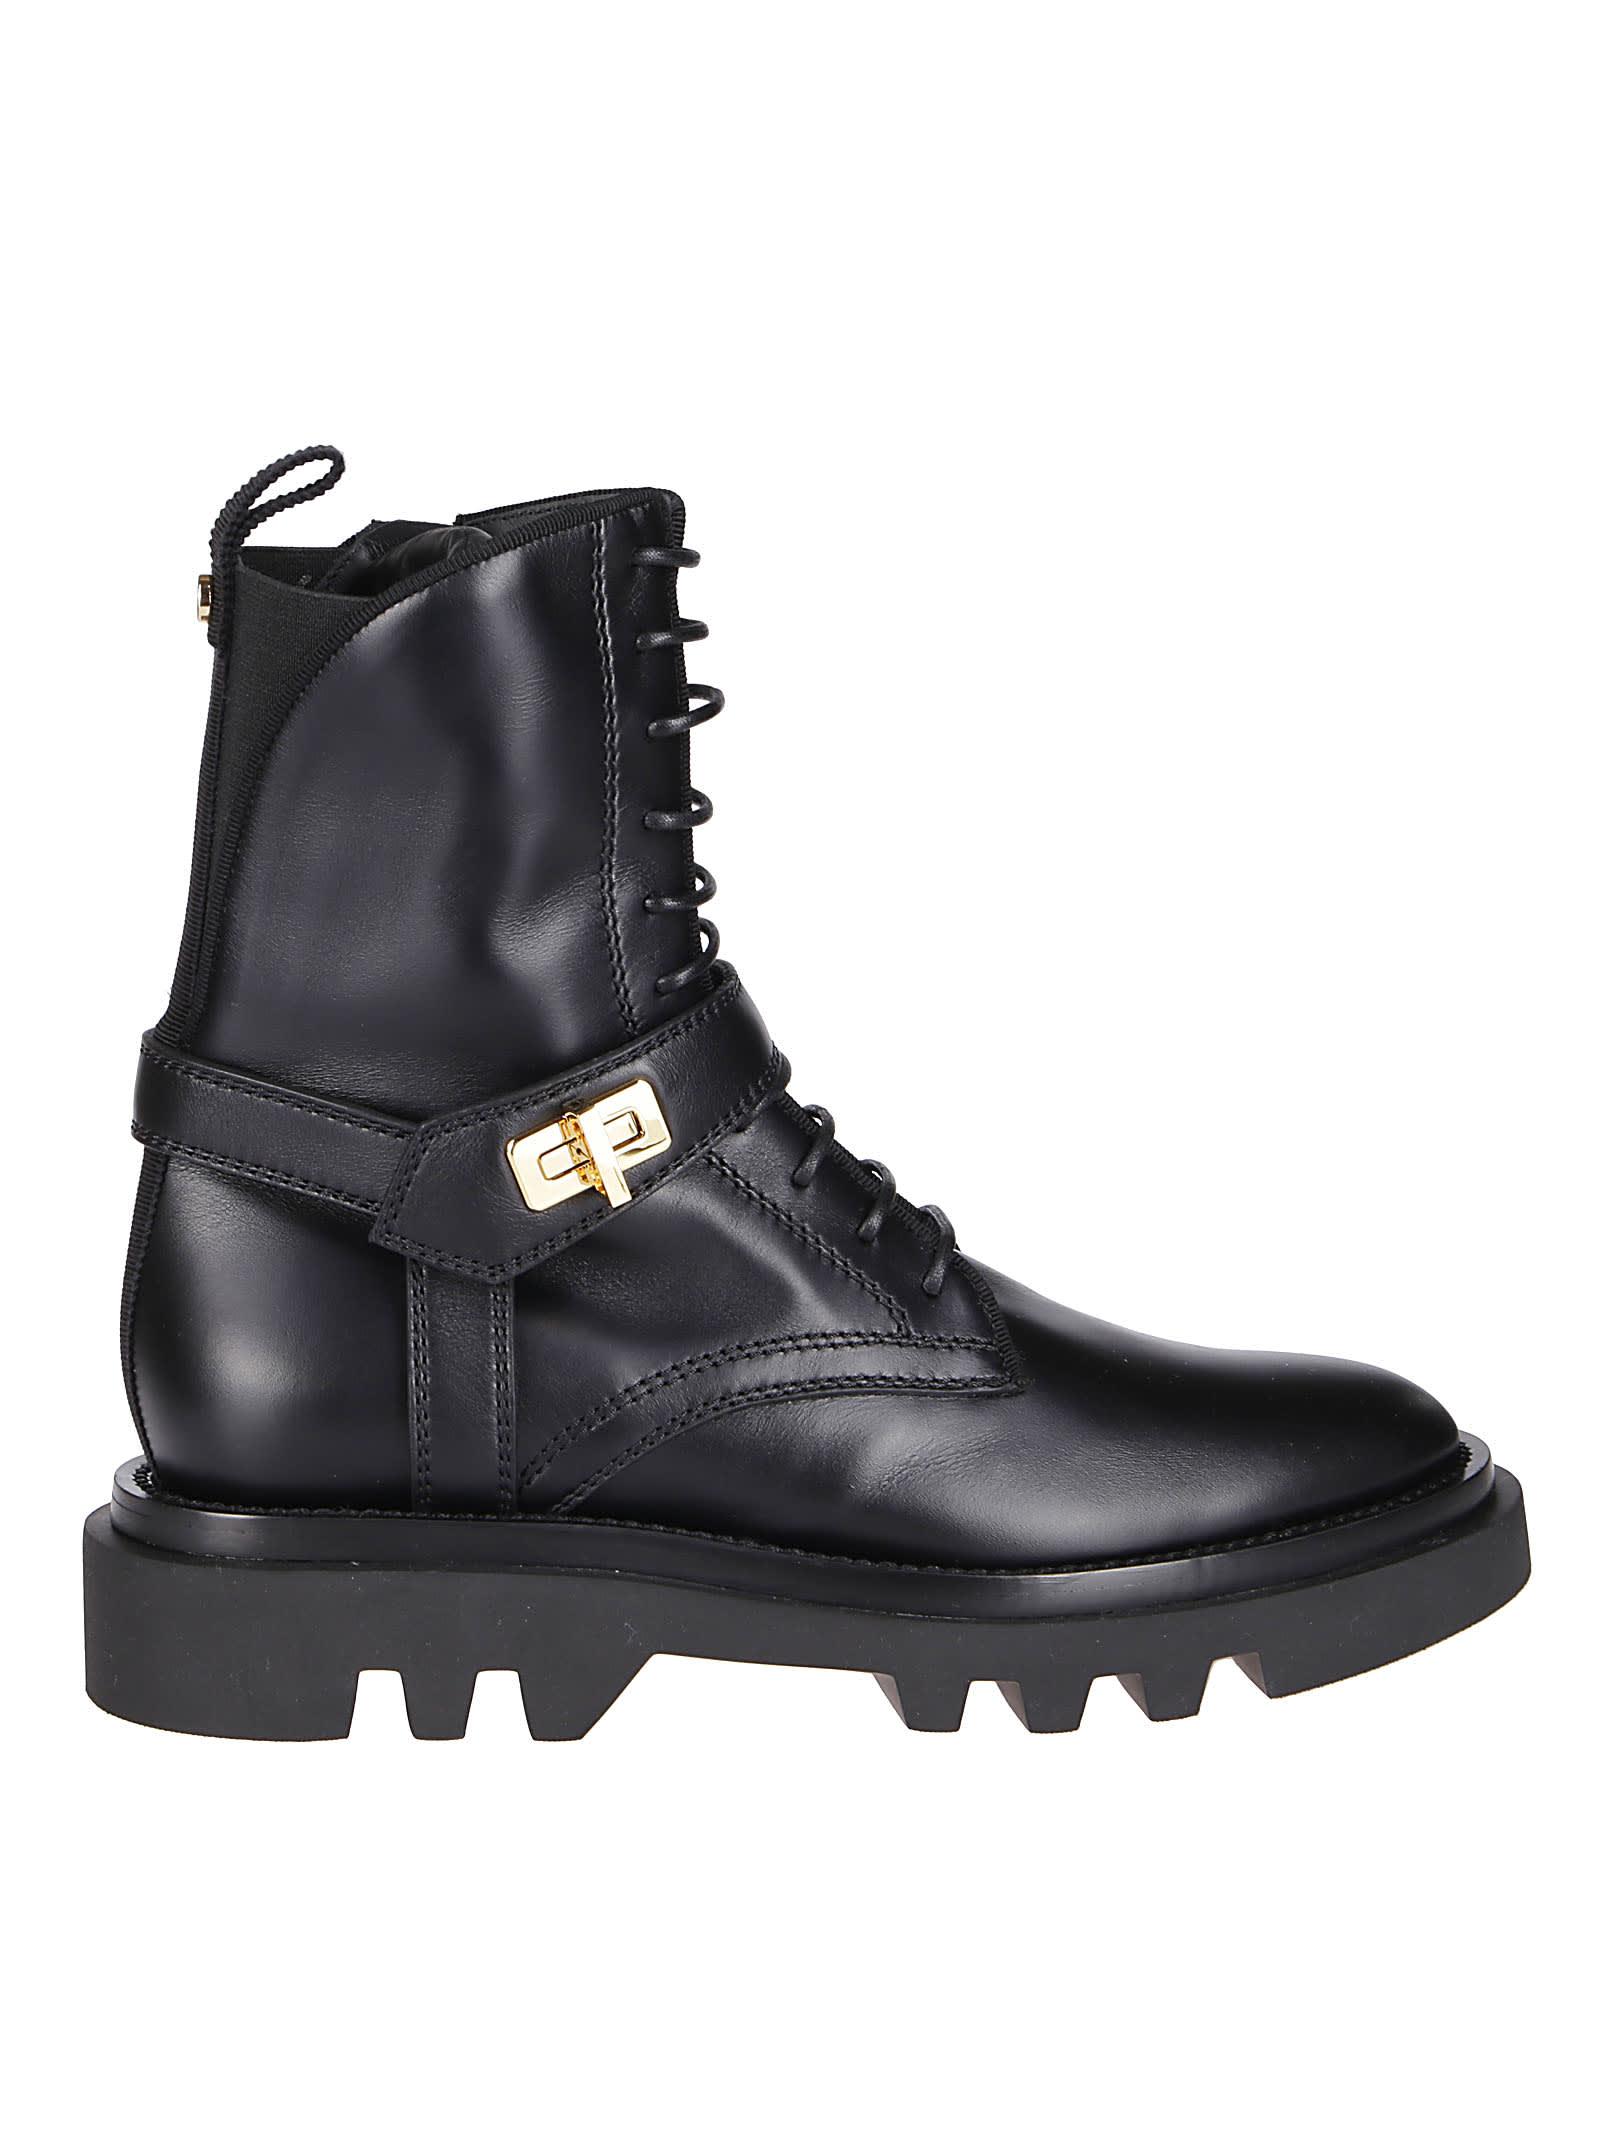 Givenchy BLACK LEATHER EDEN RANGER BOOTS